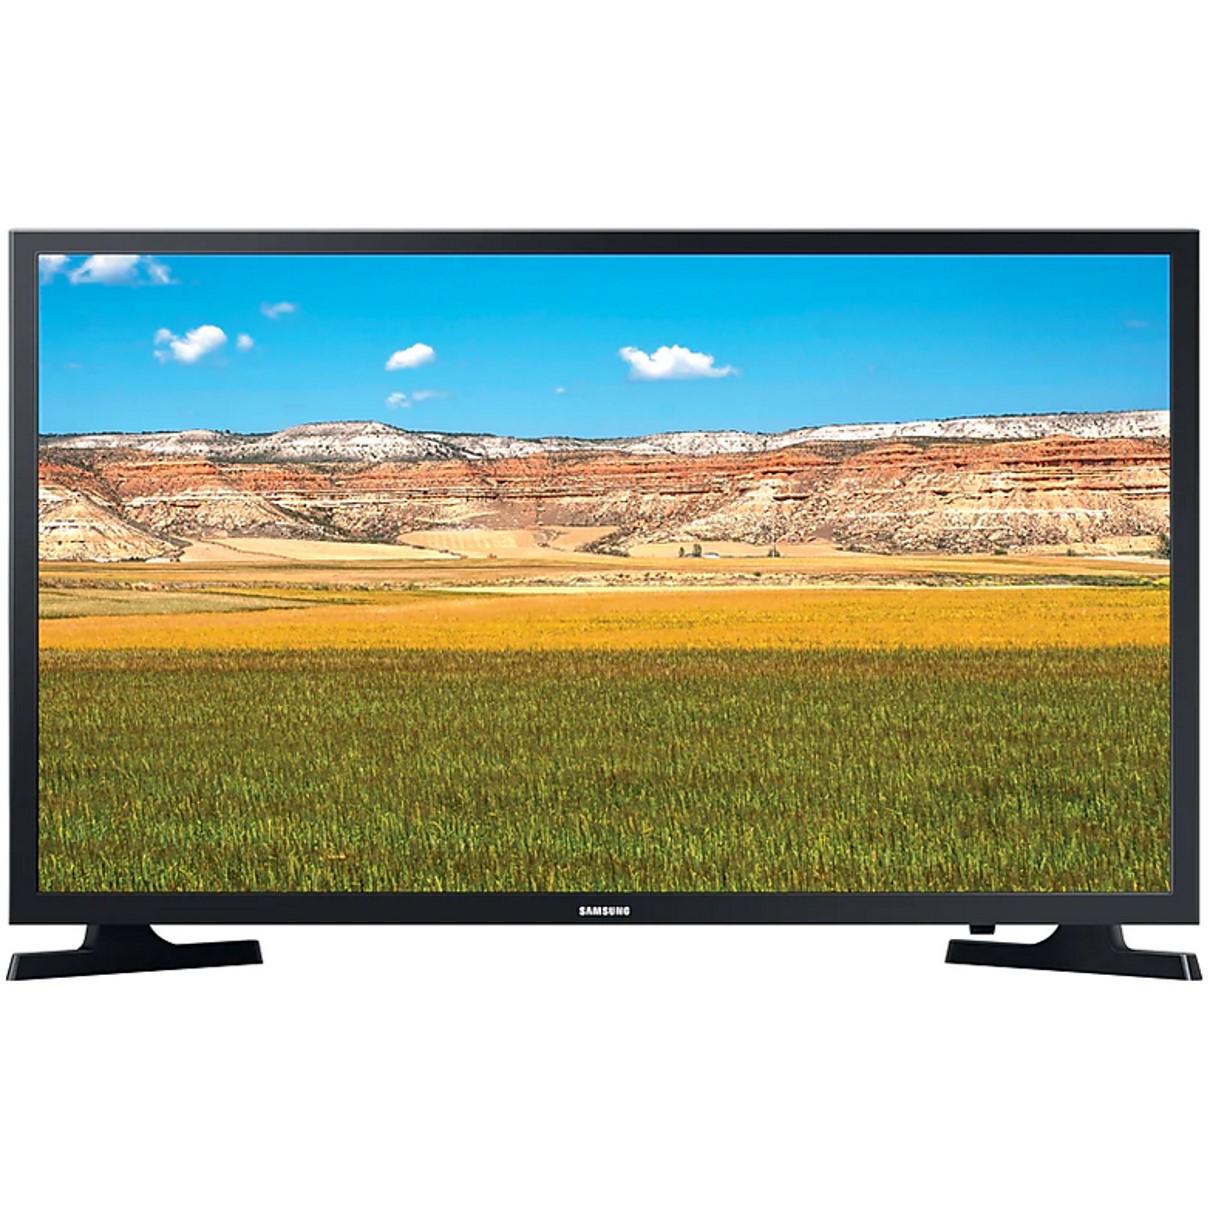 Tv samsung 32pulgadas led hd ready -  ue32t4305 -  hdr -  smart tv -  2 hdmi -  1 usb -  tdt2